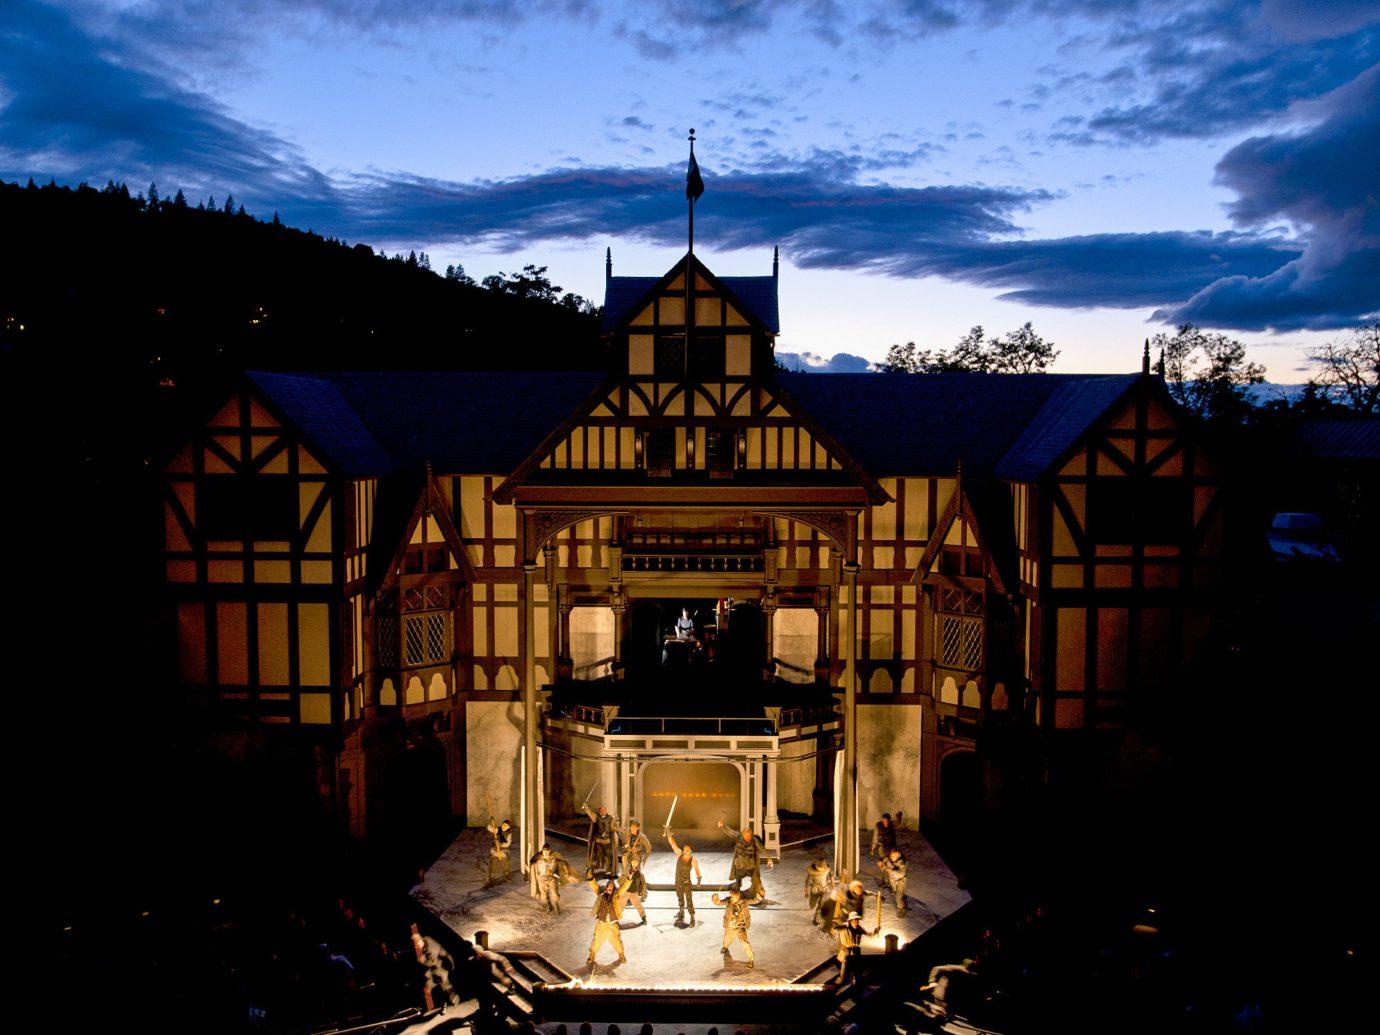 Trip Ideas sky outdoor landmark reflection tourist attraction night evening lighting building château facade darkness tourism City dark